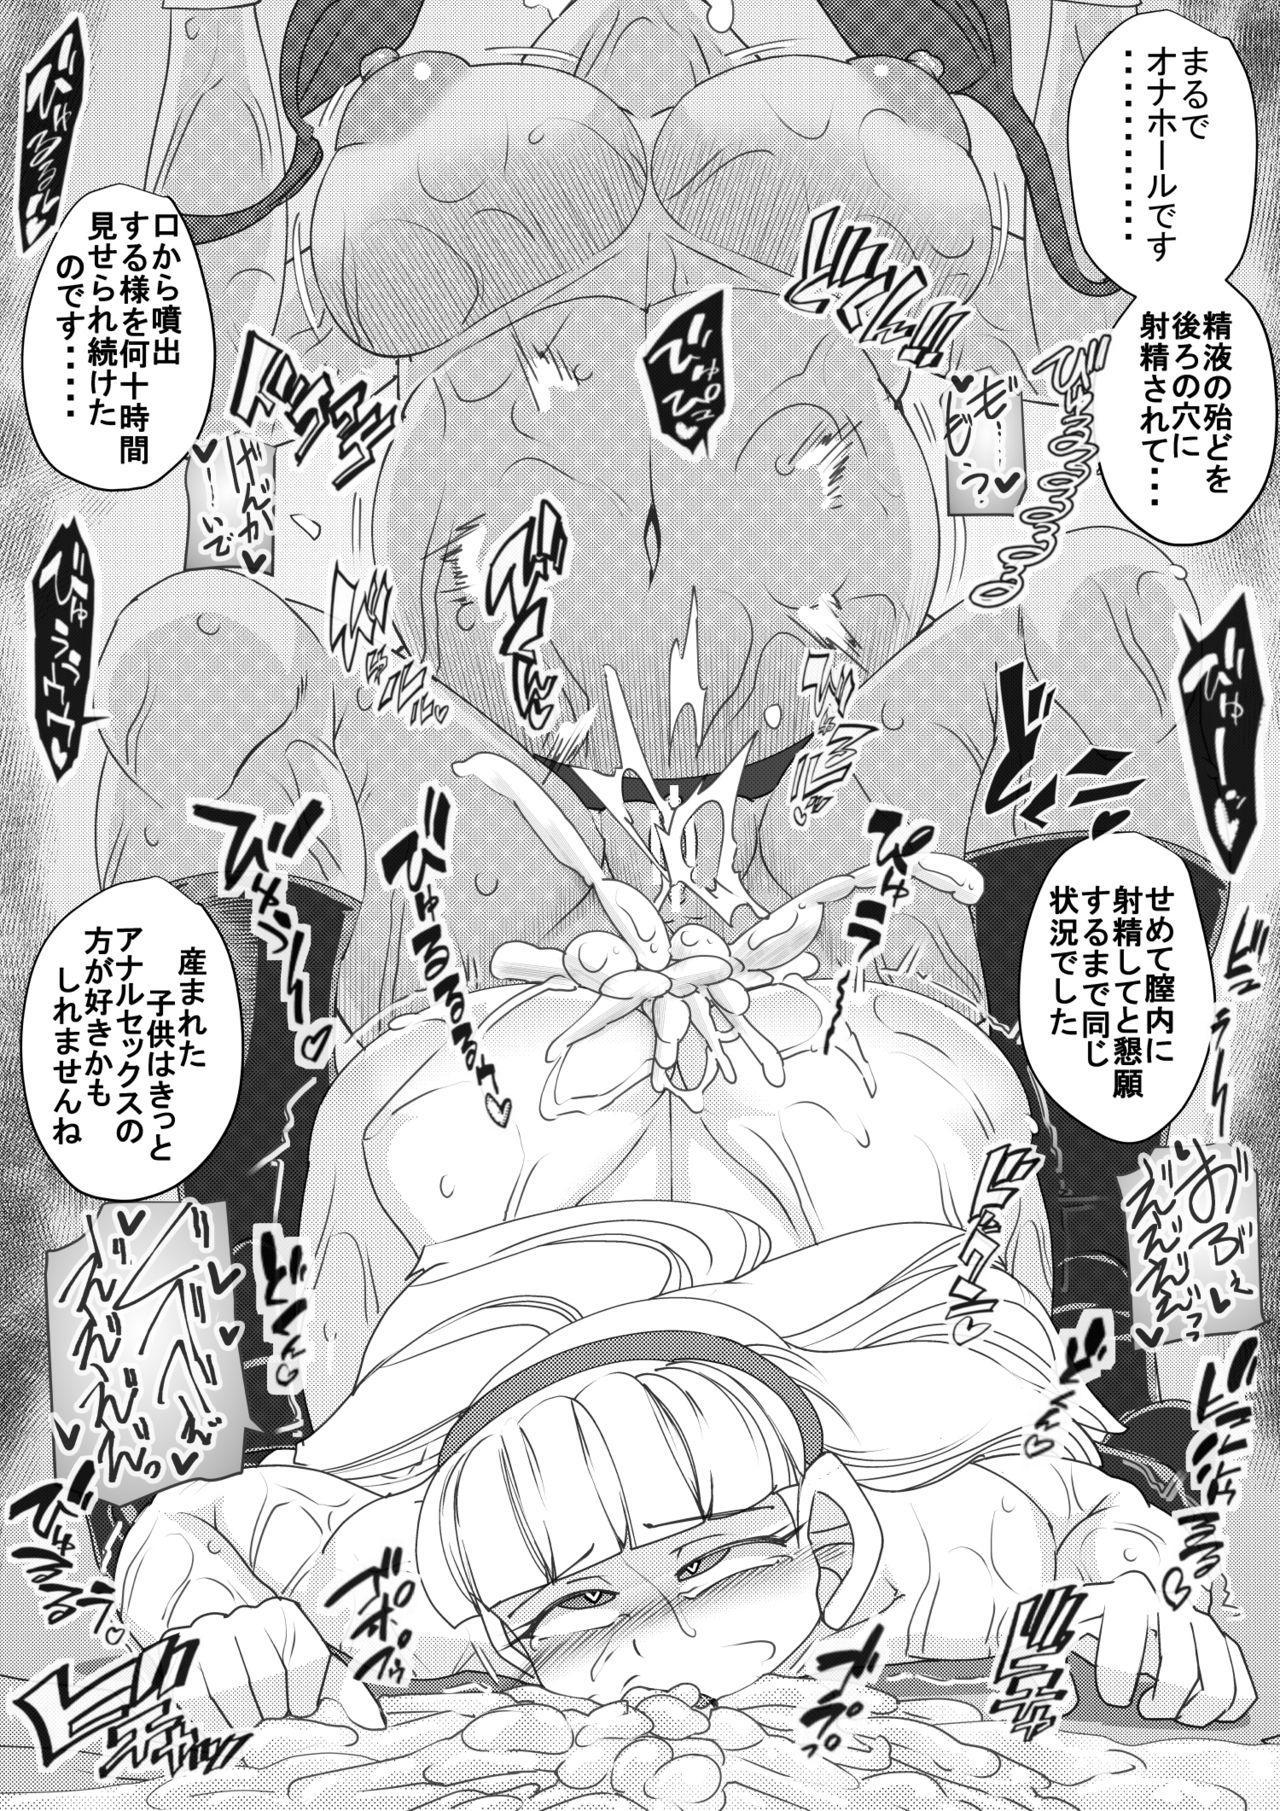 Haramachi 5 8